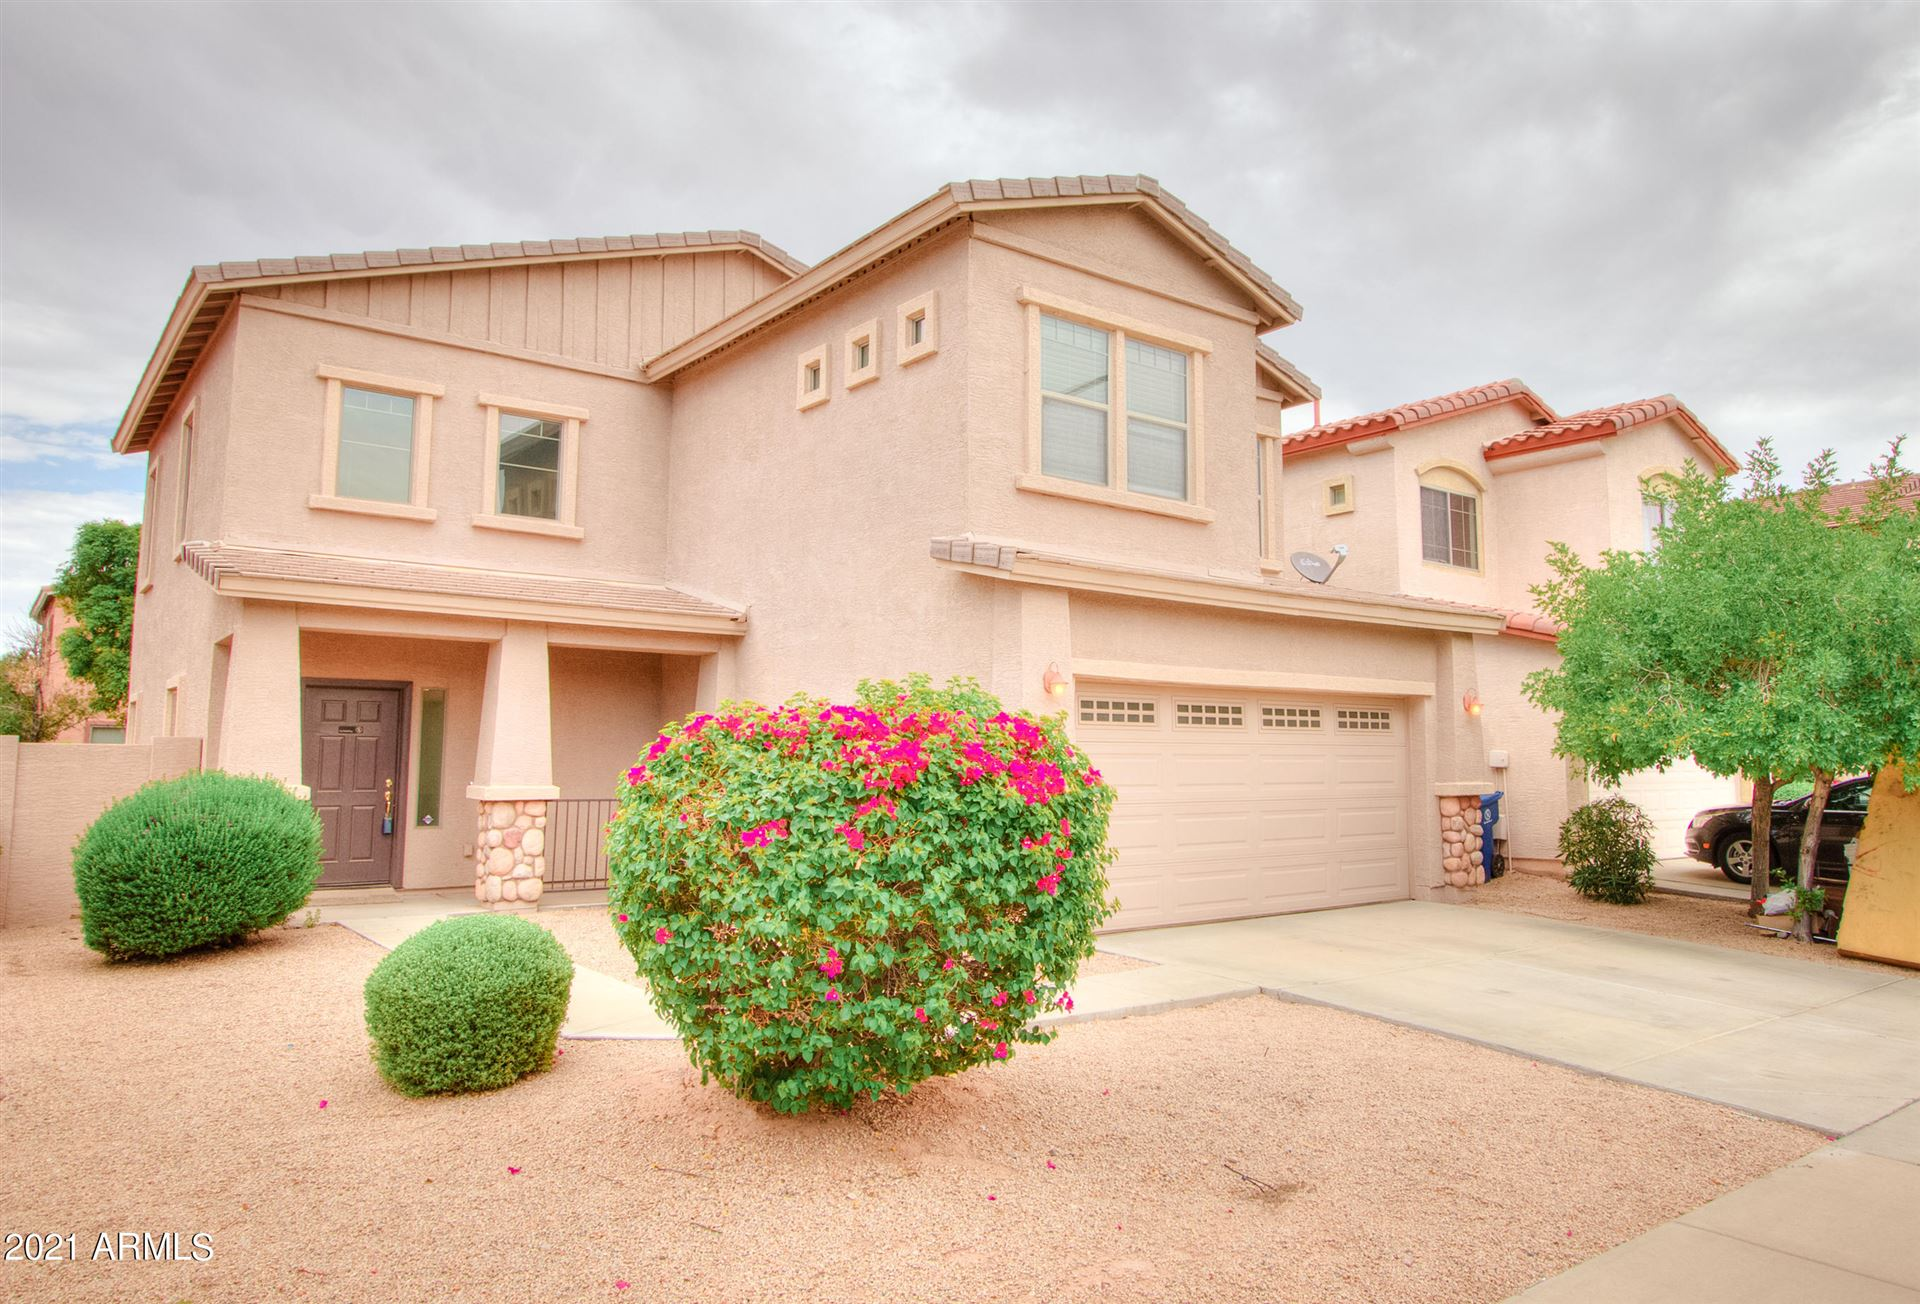 Photo of 17590 W Bridger Street, Surprise, AZ 85388 (MLS # 6272193)